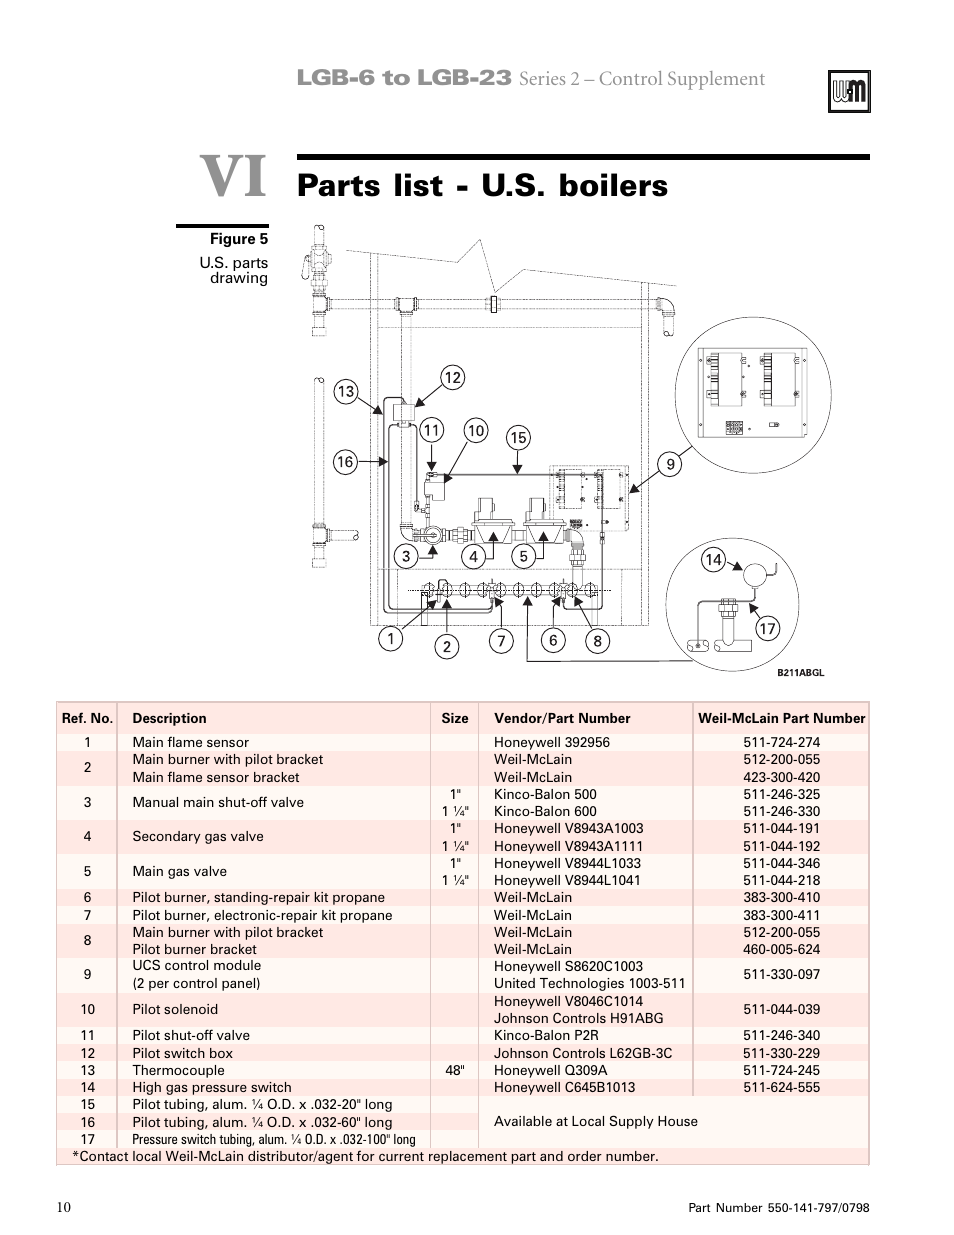 Fantastic Weil Mclain Baseboard Parts Ideas - Simple Wiring Diagram ...